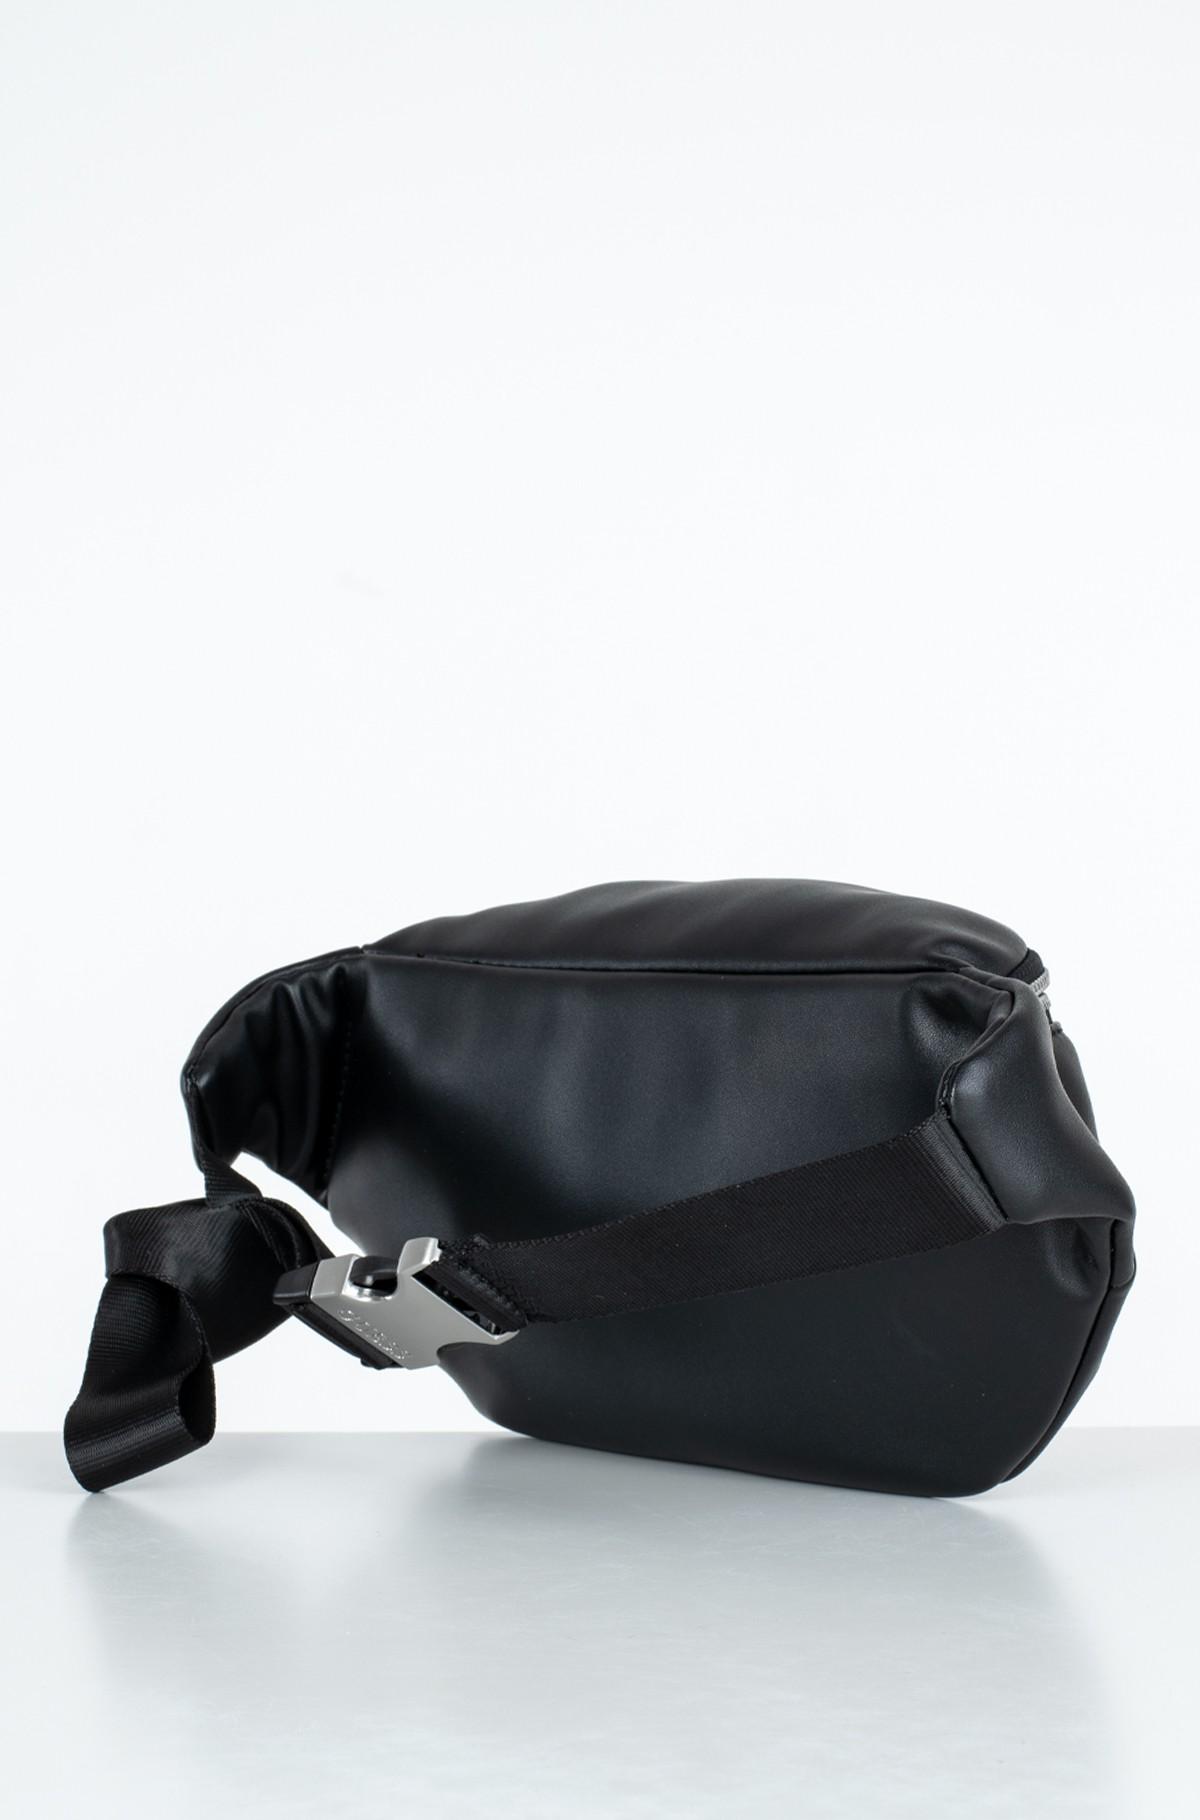 Belt bag HMSAOR P1230-full-3